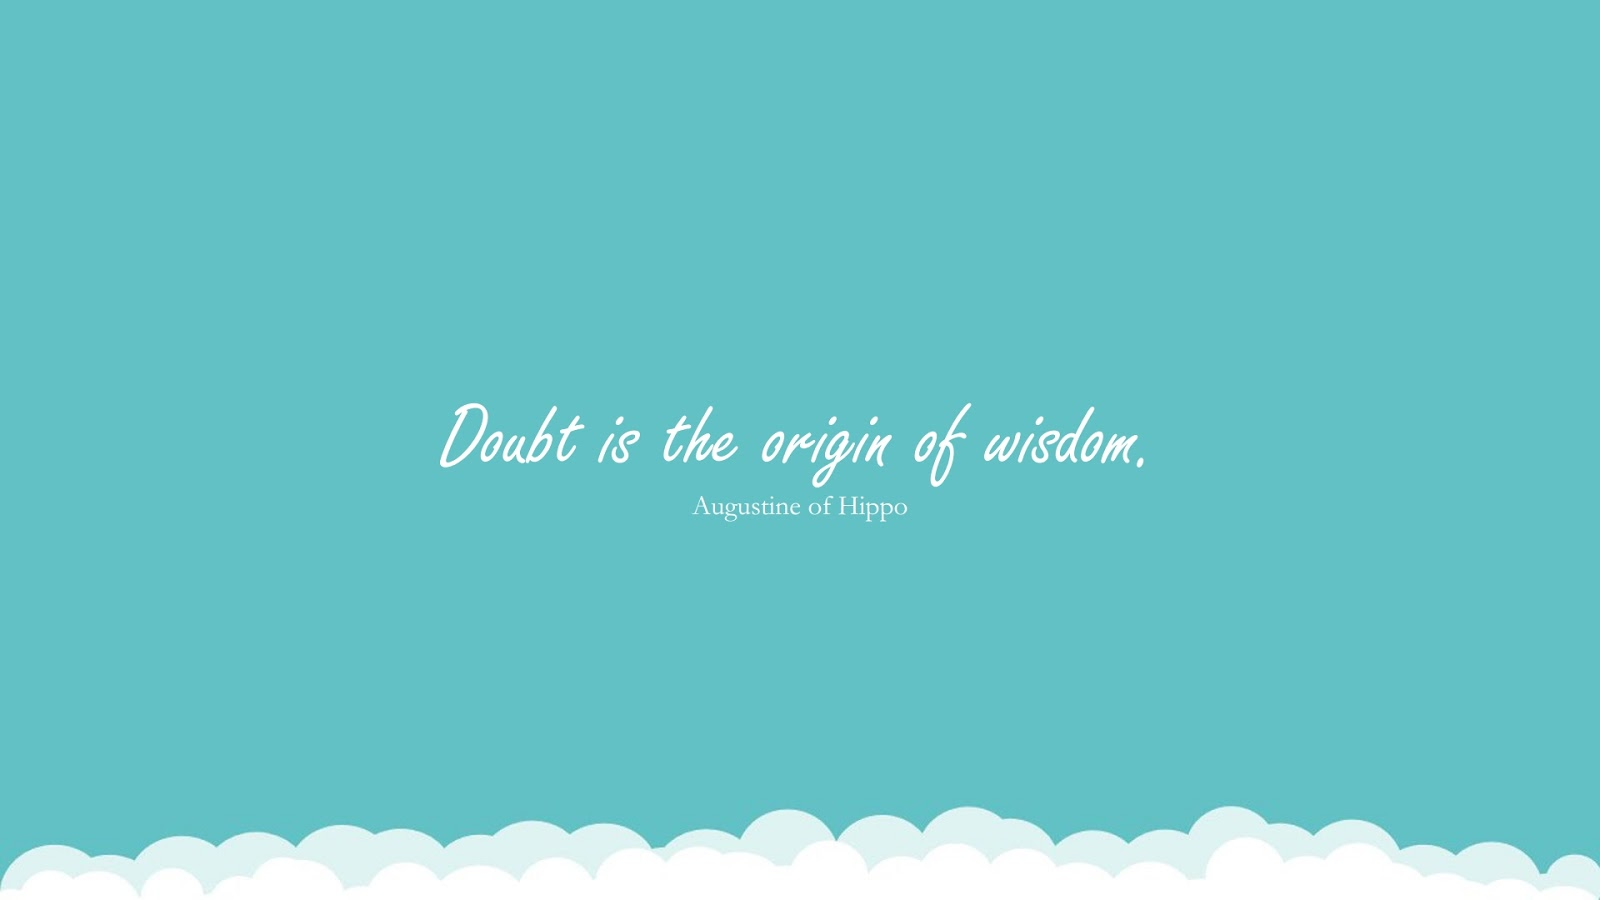 Doubt is the origin of wisdom. (Augustine of Hippo);  #WordsofWisdom